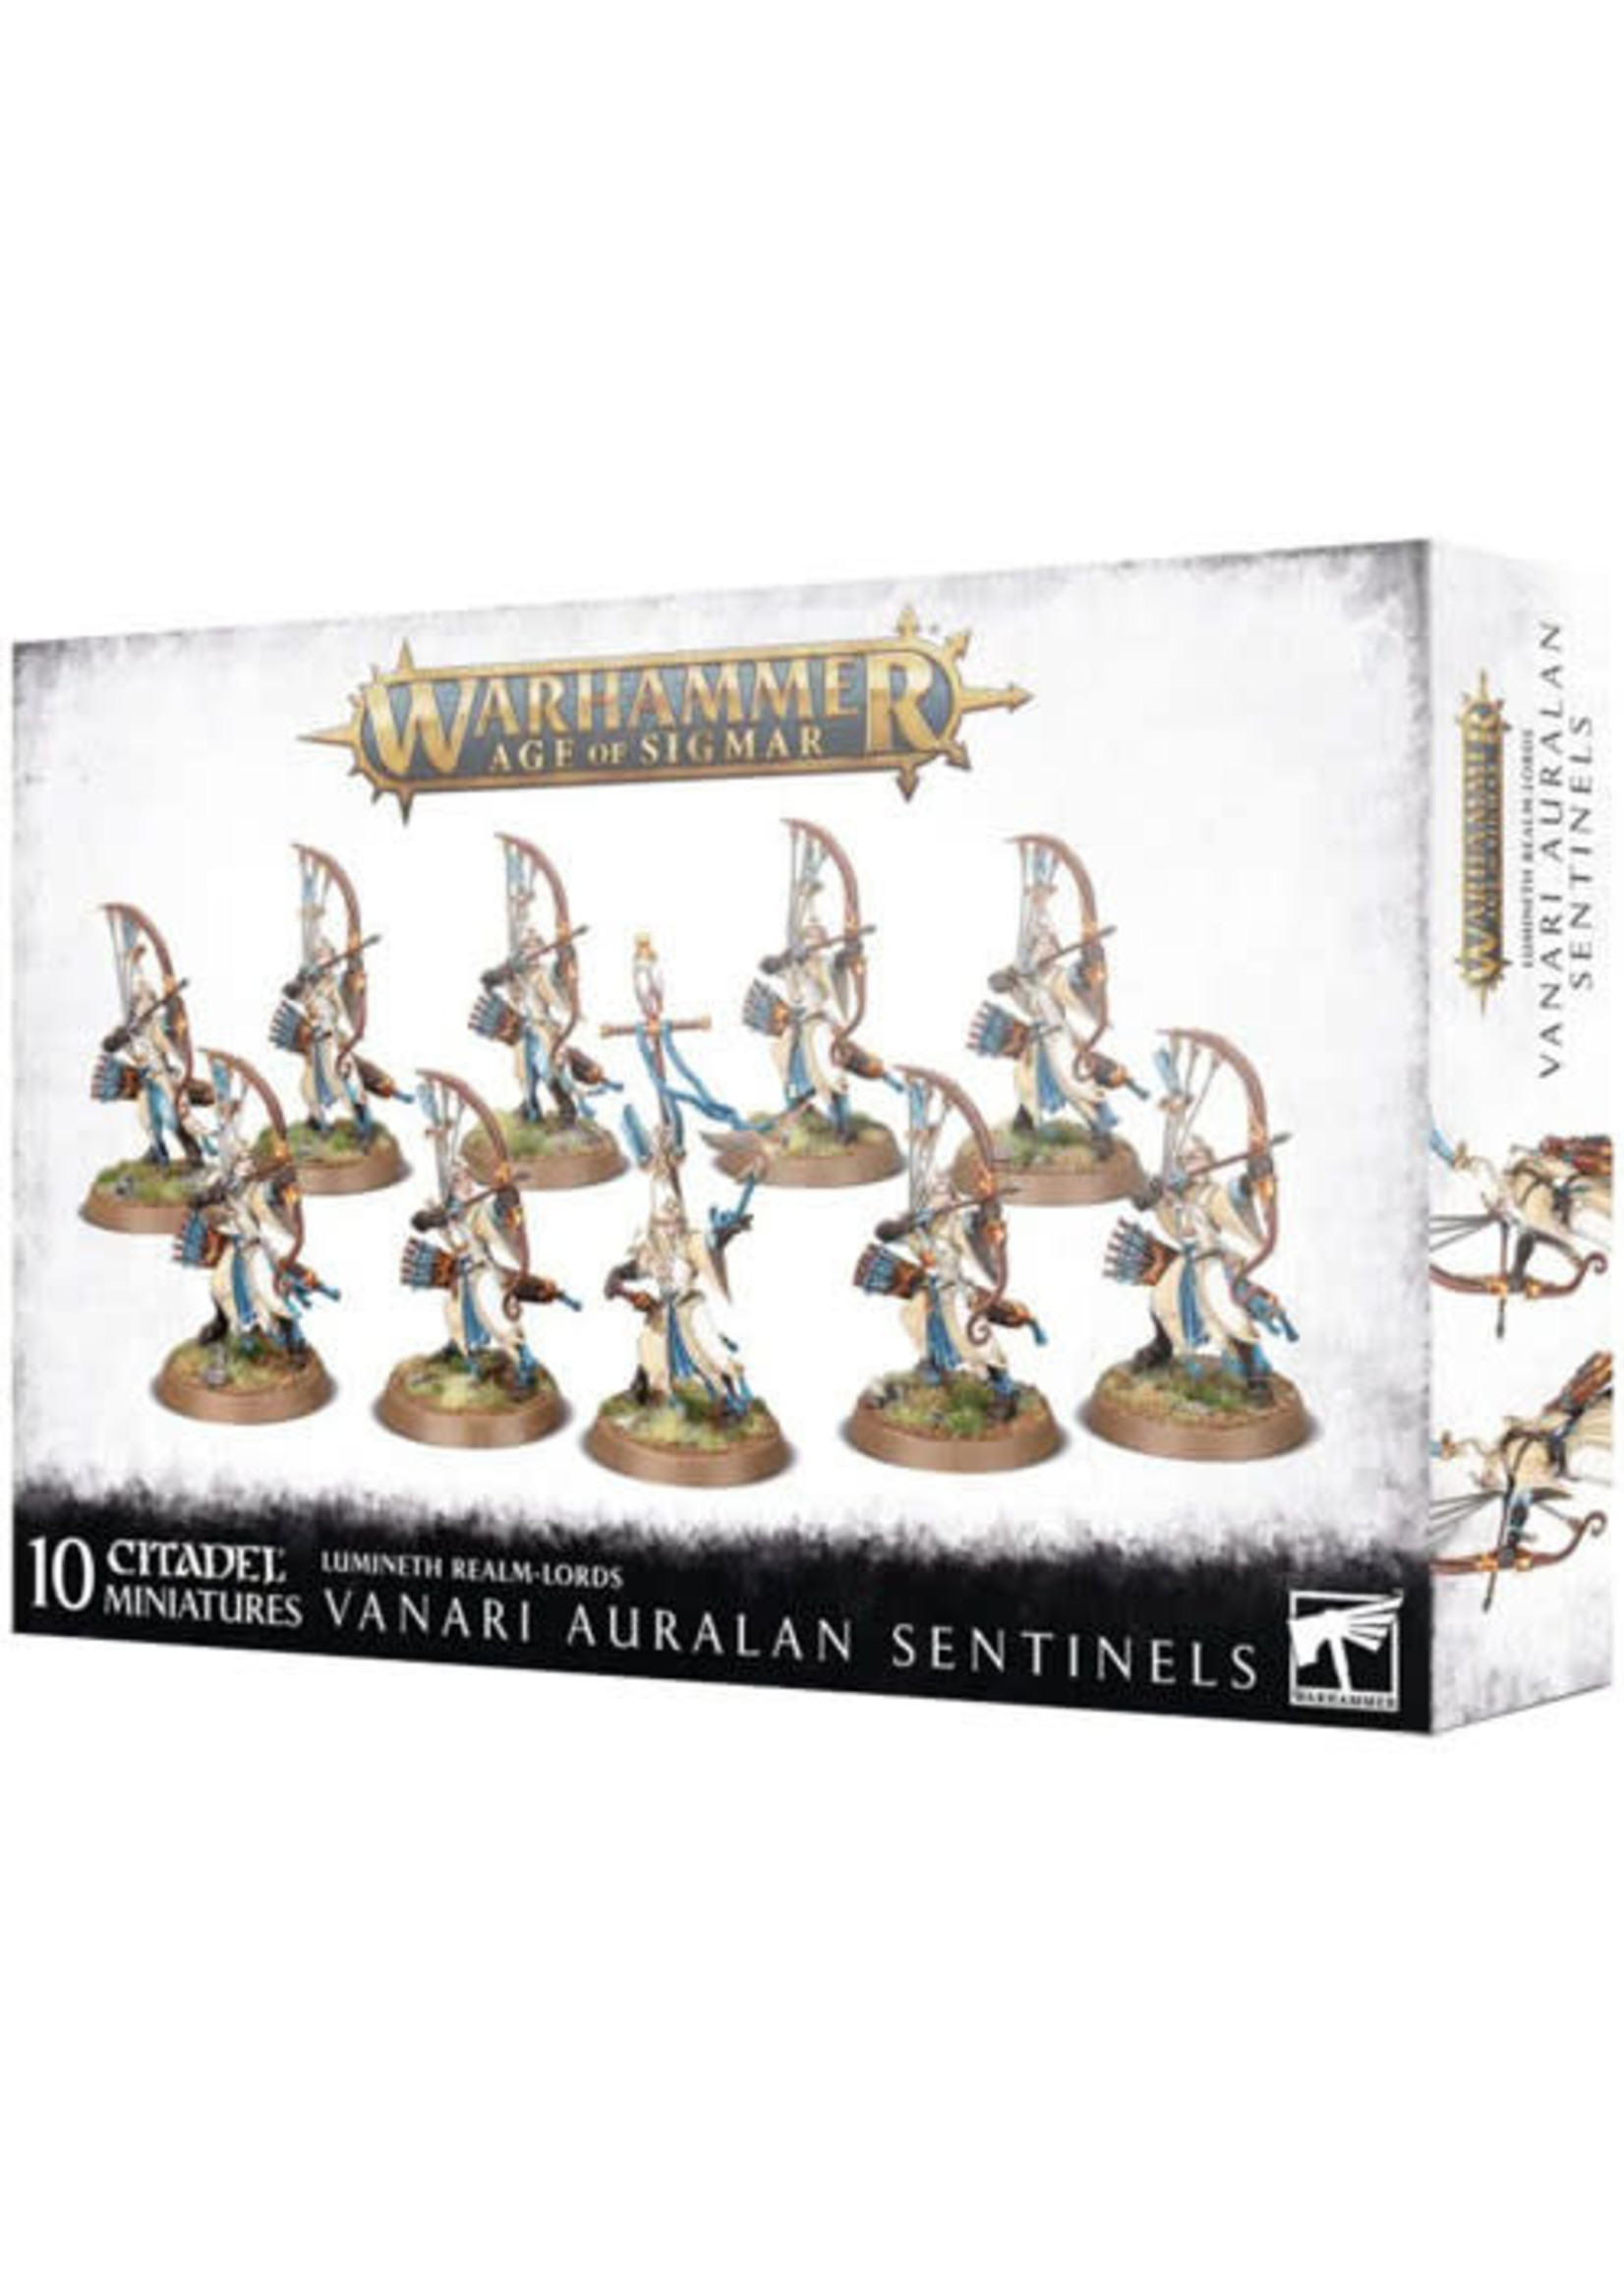 Lumineth Realm Lords Vanari Auralan Sentinels (AOS)